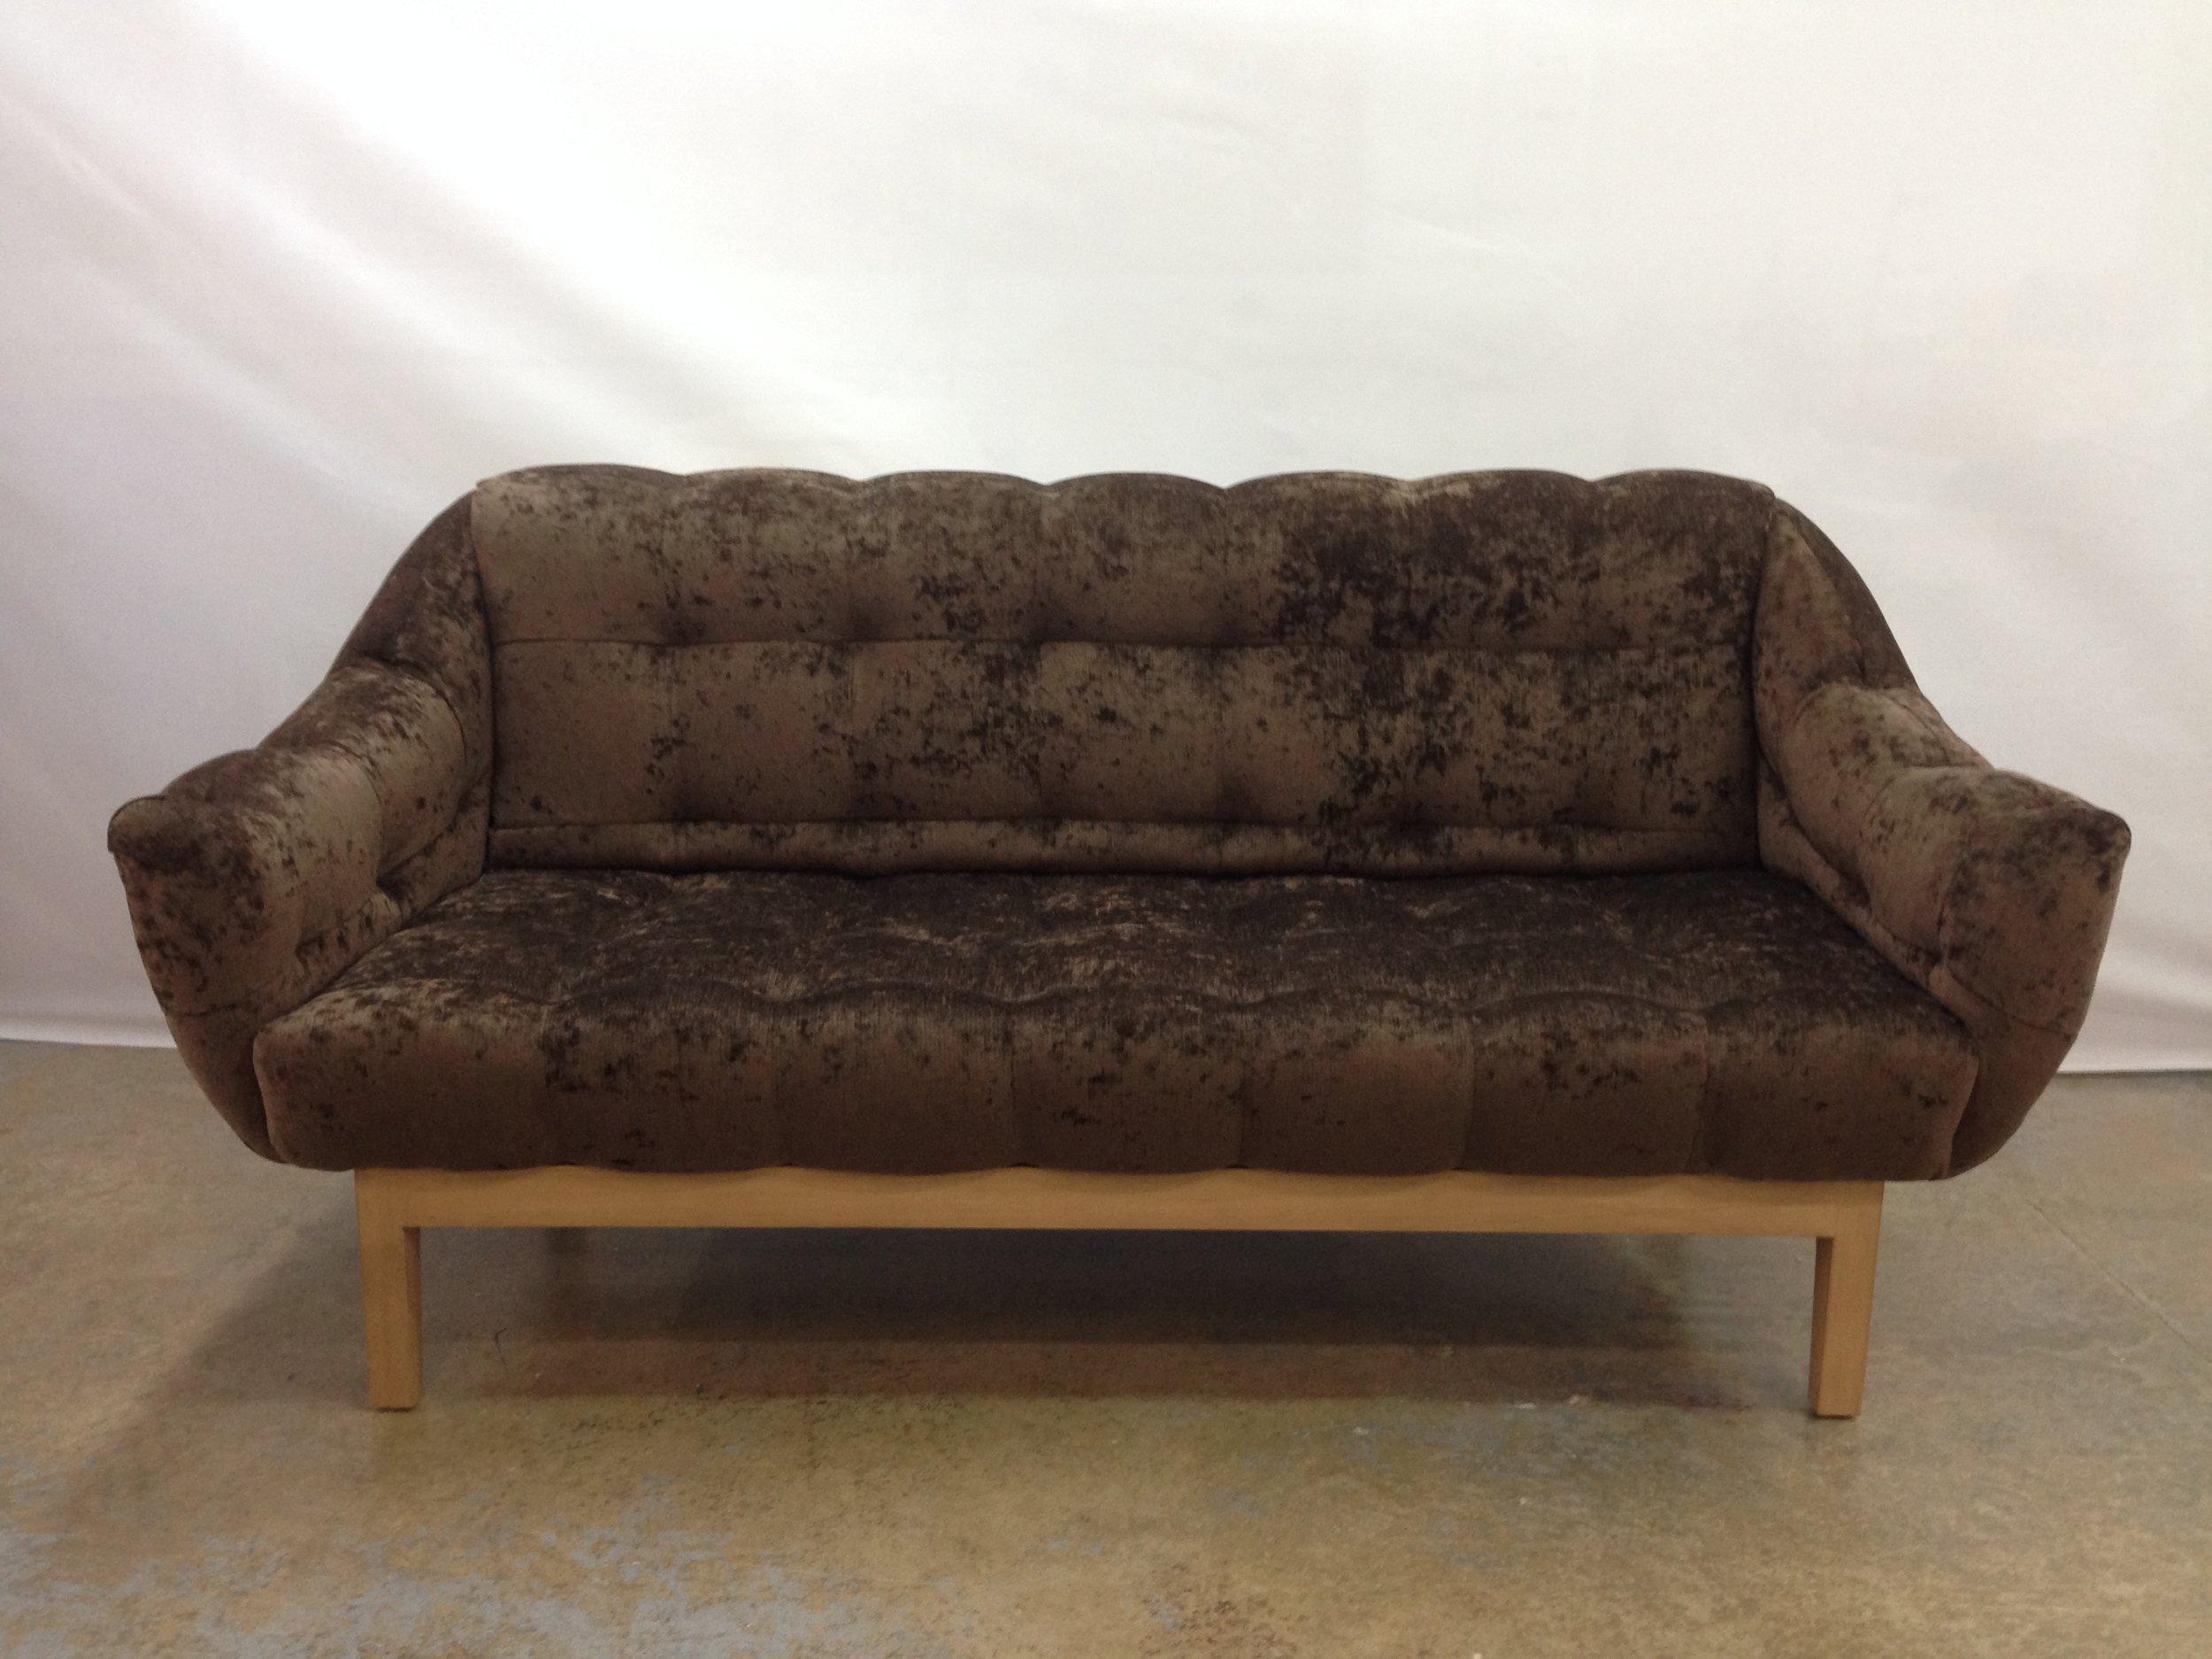 Tufted Sofa.JPG